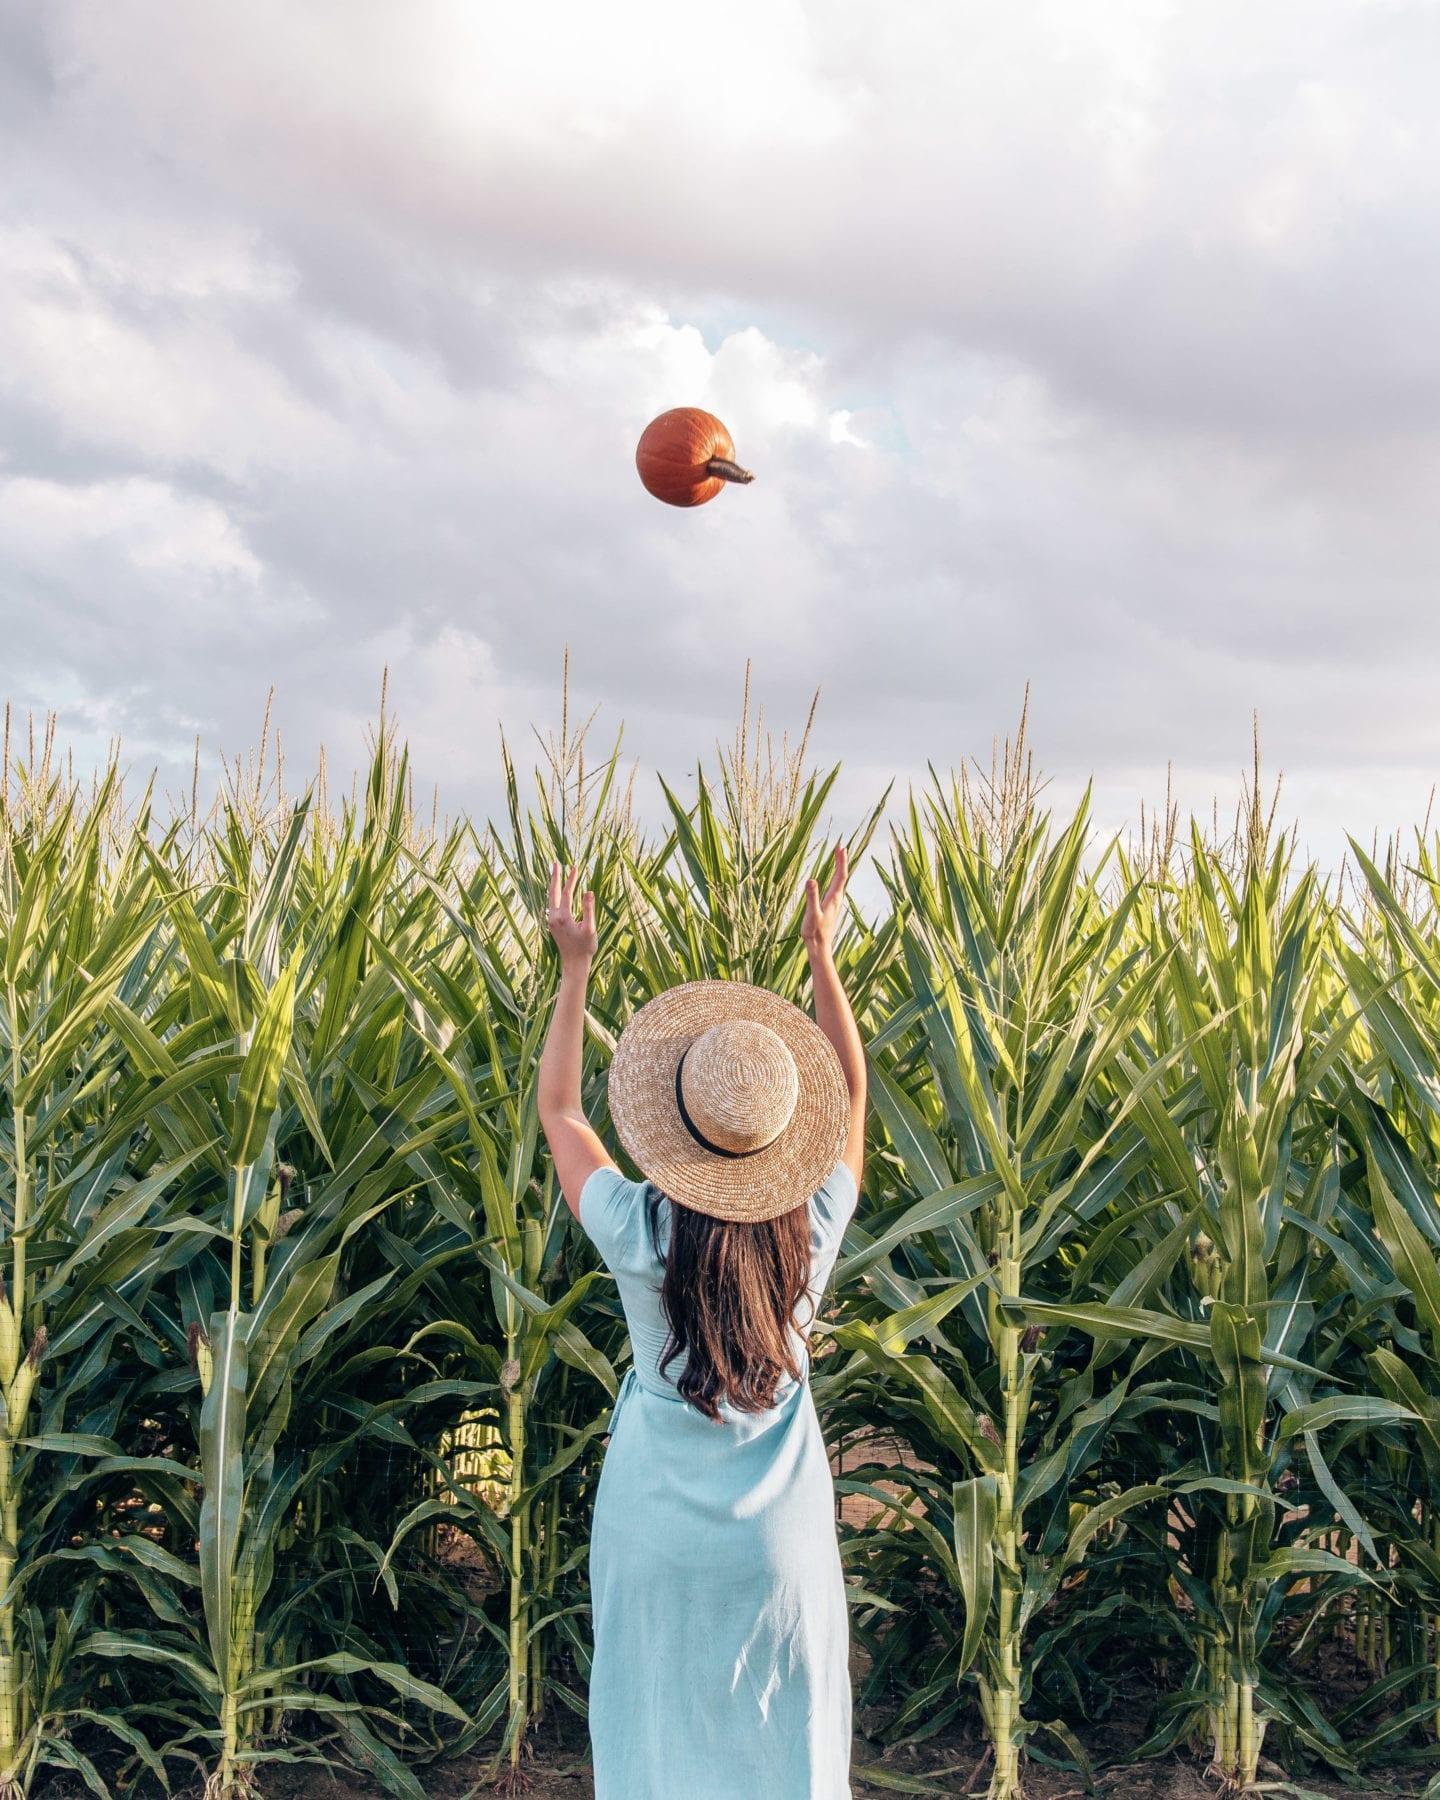 girl throwing pumpkin up into air